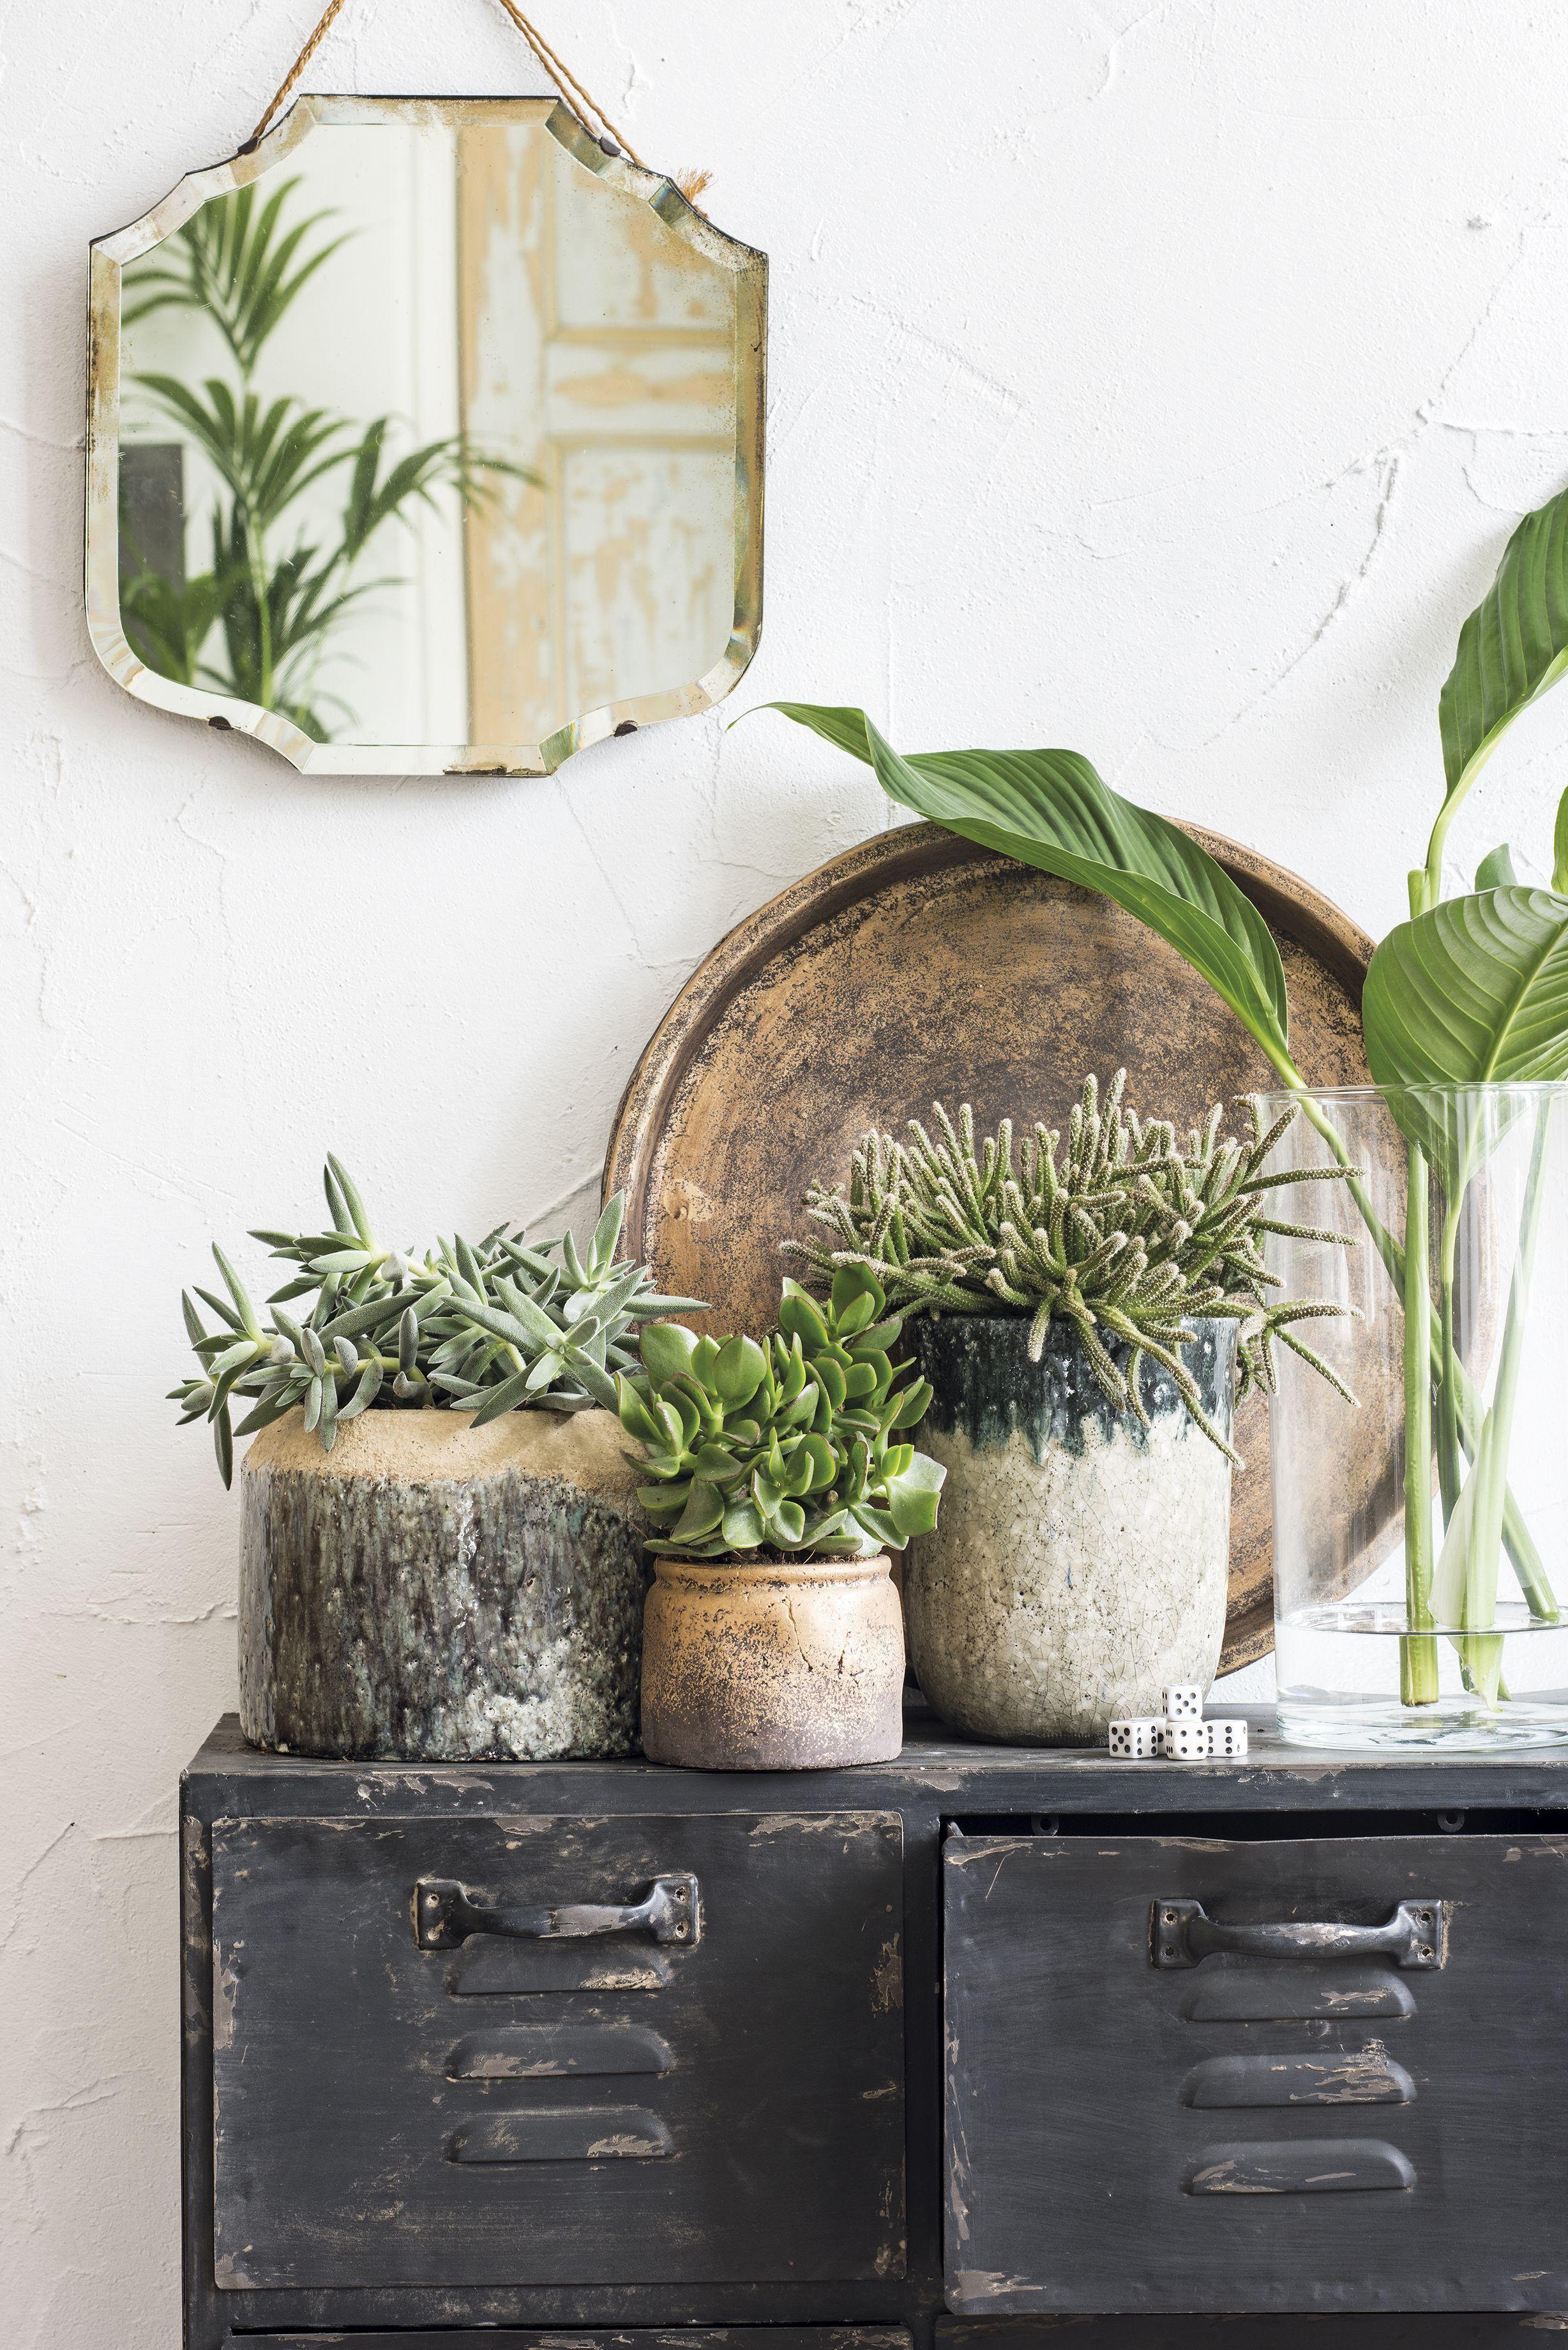 Stoere kast #kamerplanten #intratuin | Industrial Design | Pinterest ...